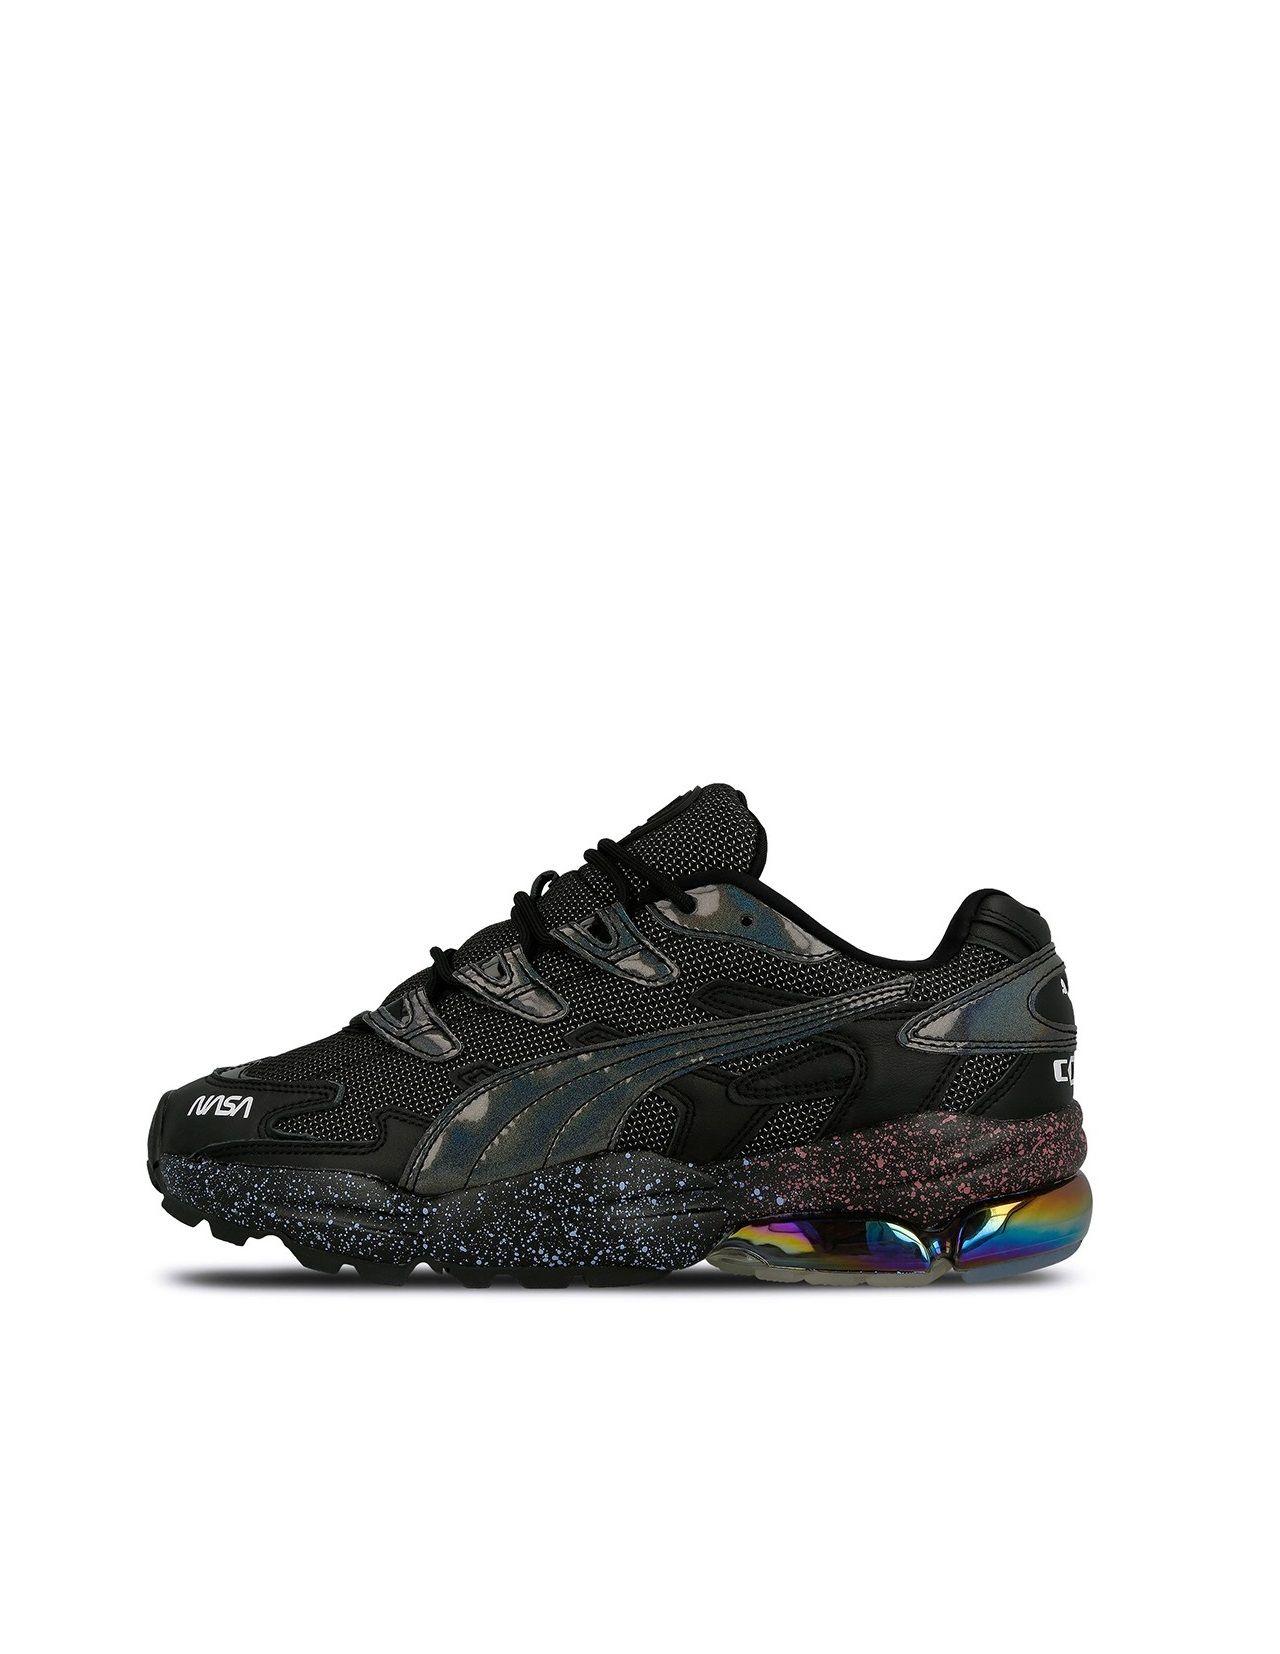 NASA x Puma Cell Alien | Puma sneakers, Puma, Sneakers